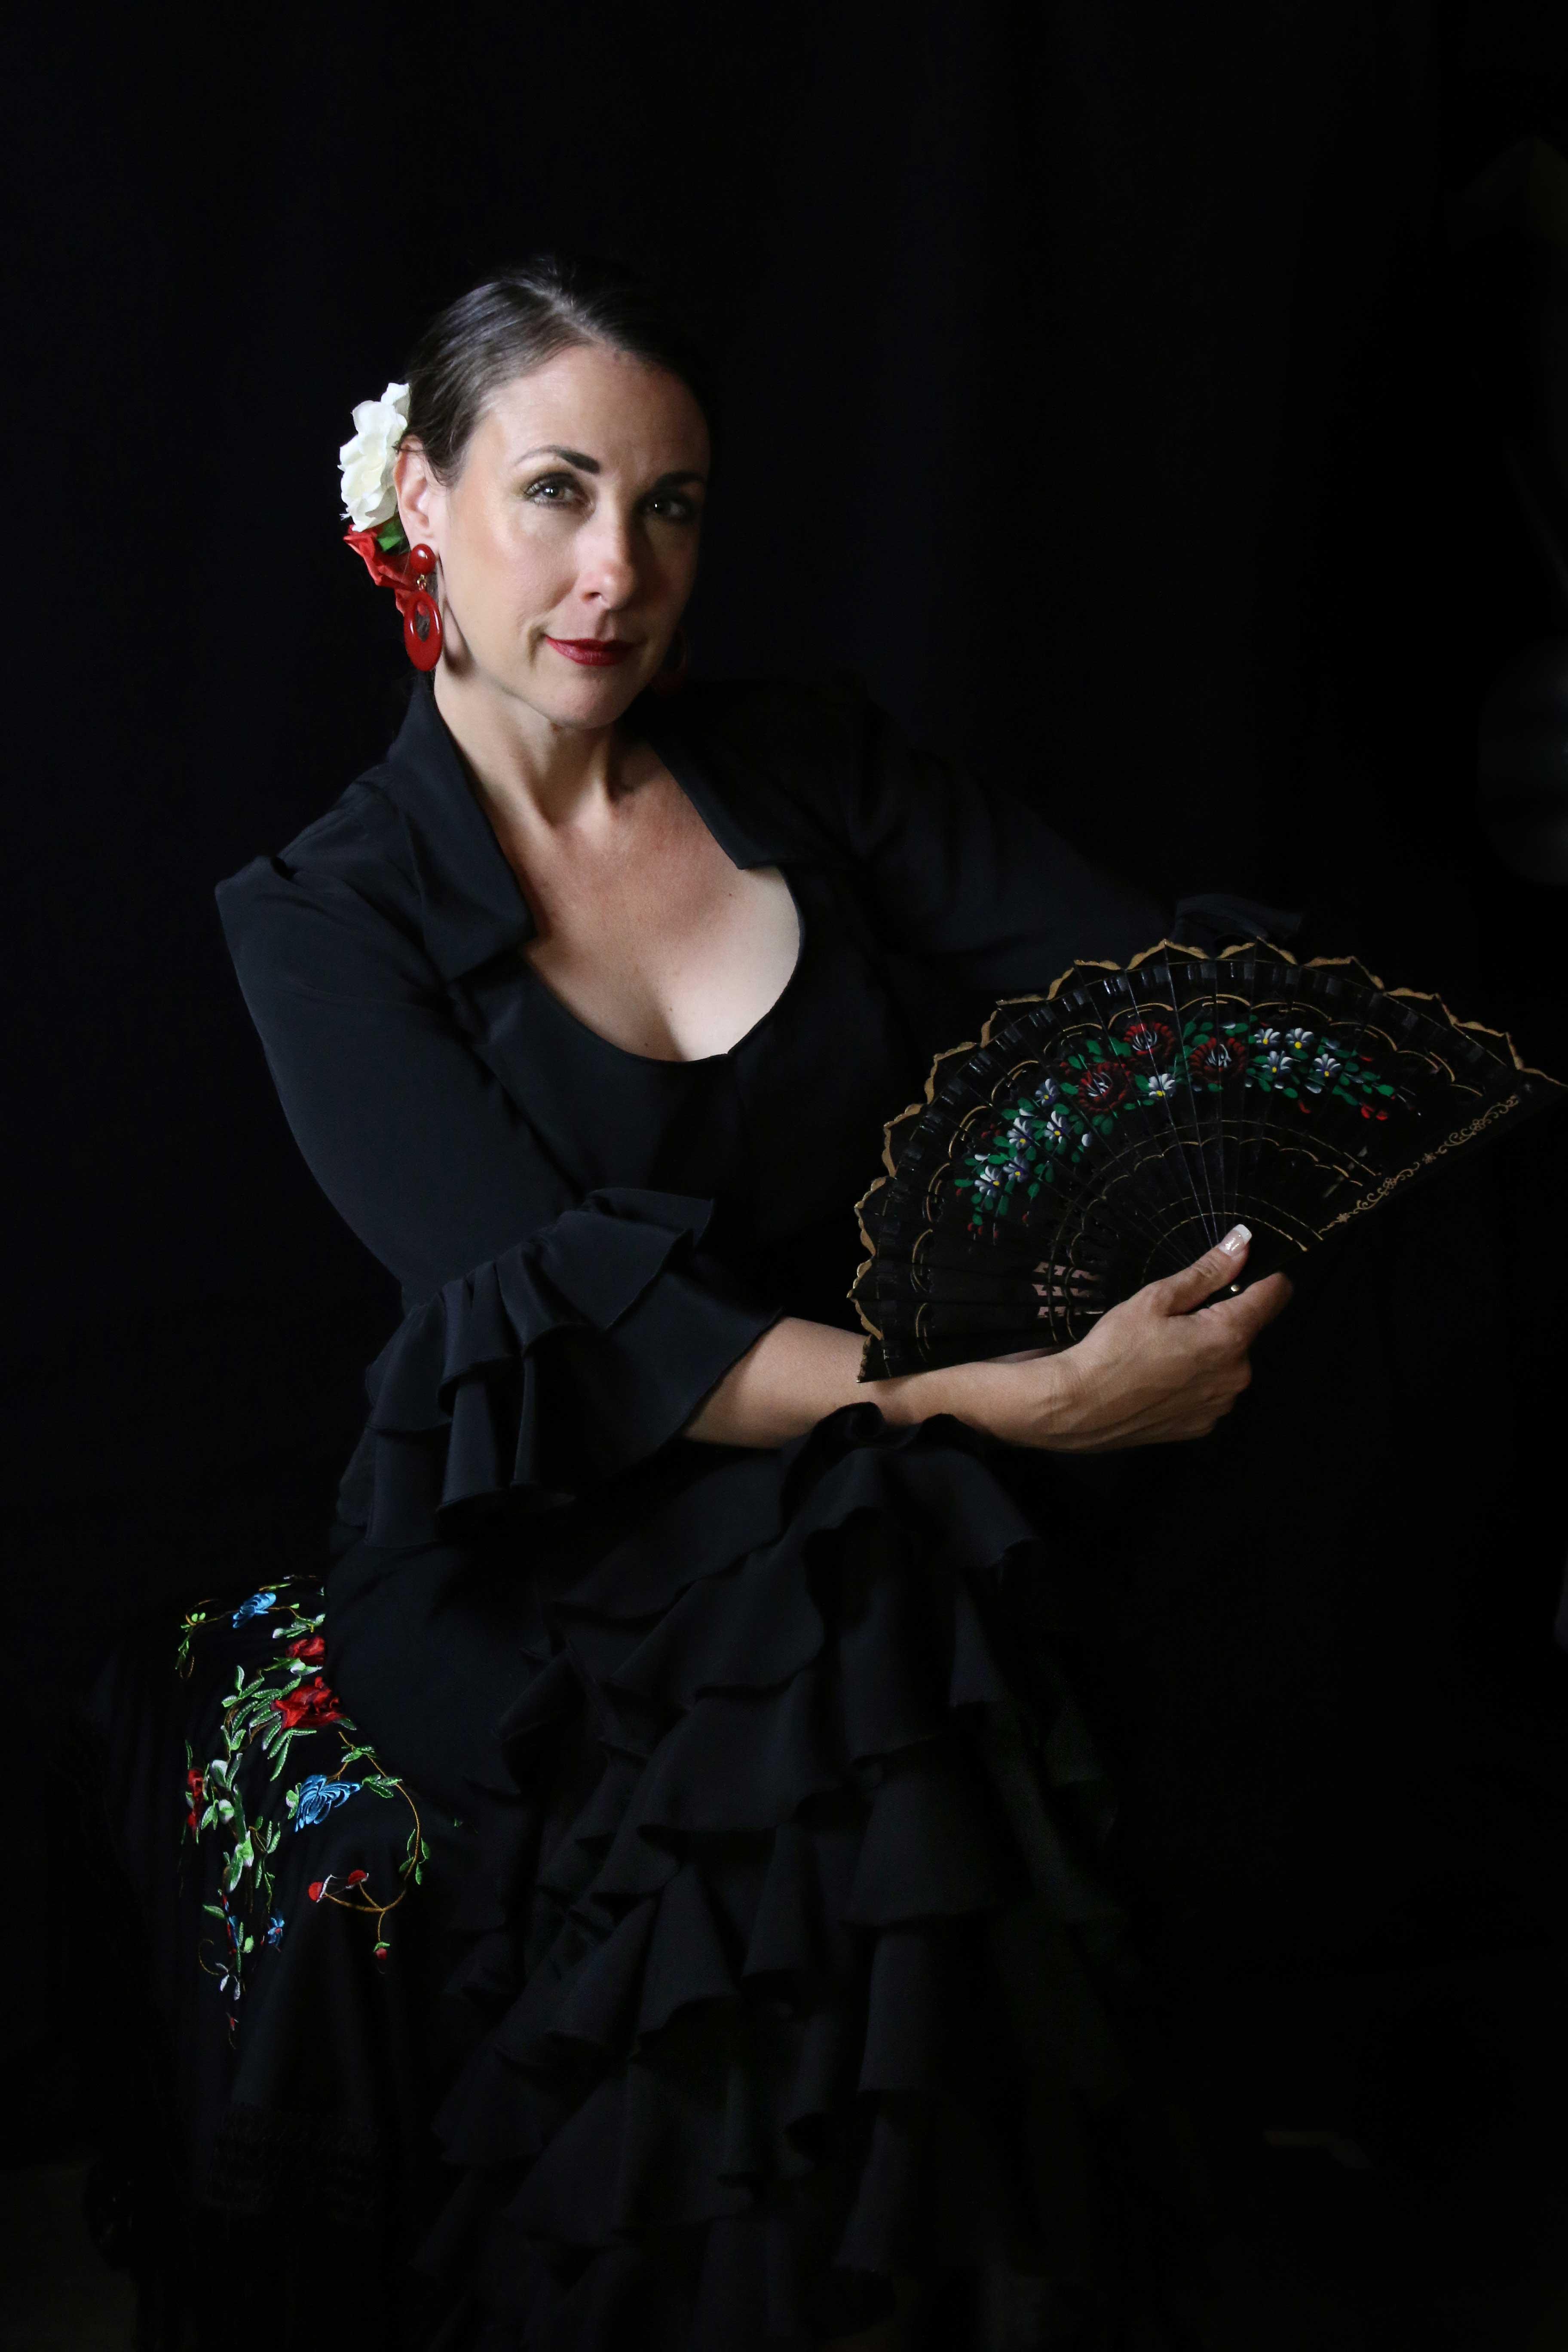 Joelle Gonçalves